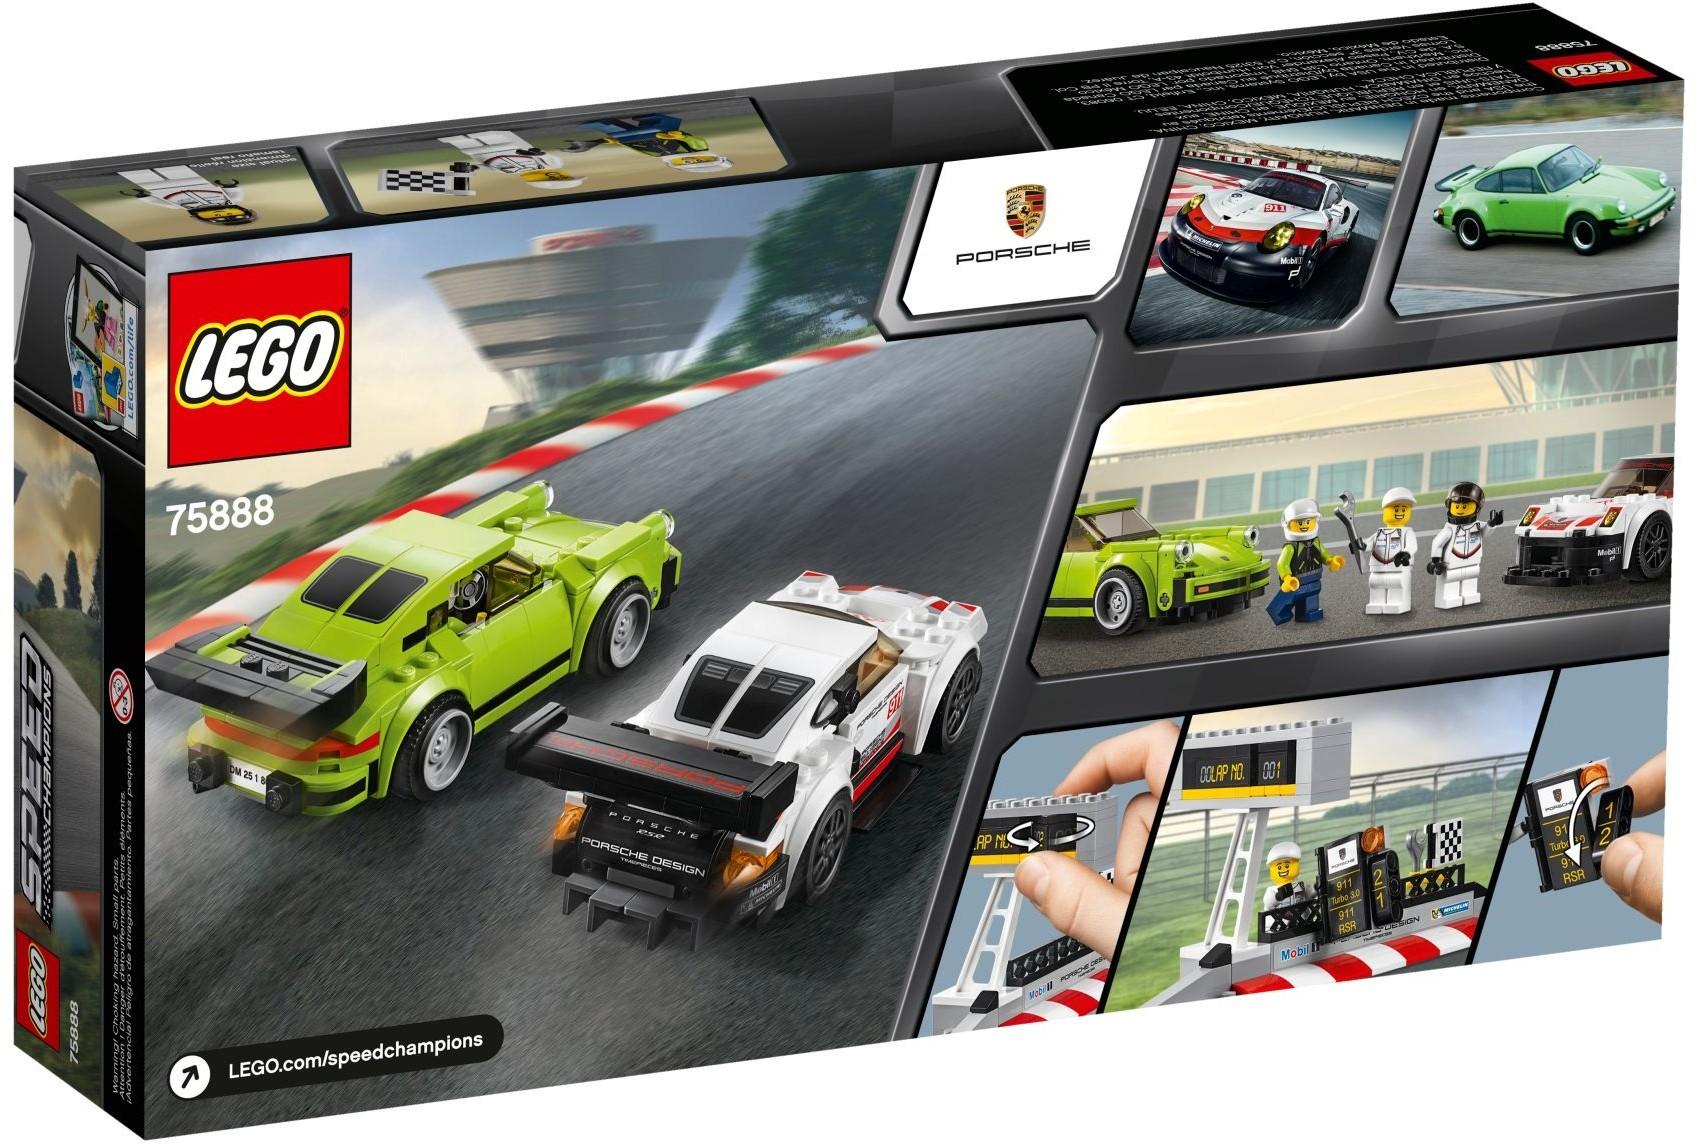 WANGE S72 Super Racing Cars: Porsche 911 RSR and Porsche 911 Turbo 3.0 2